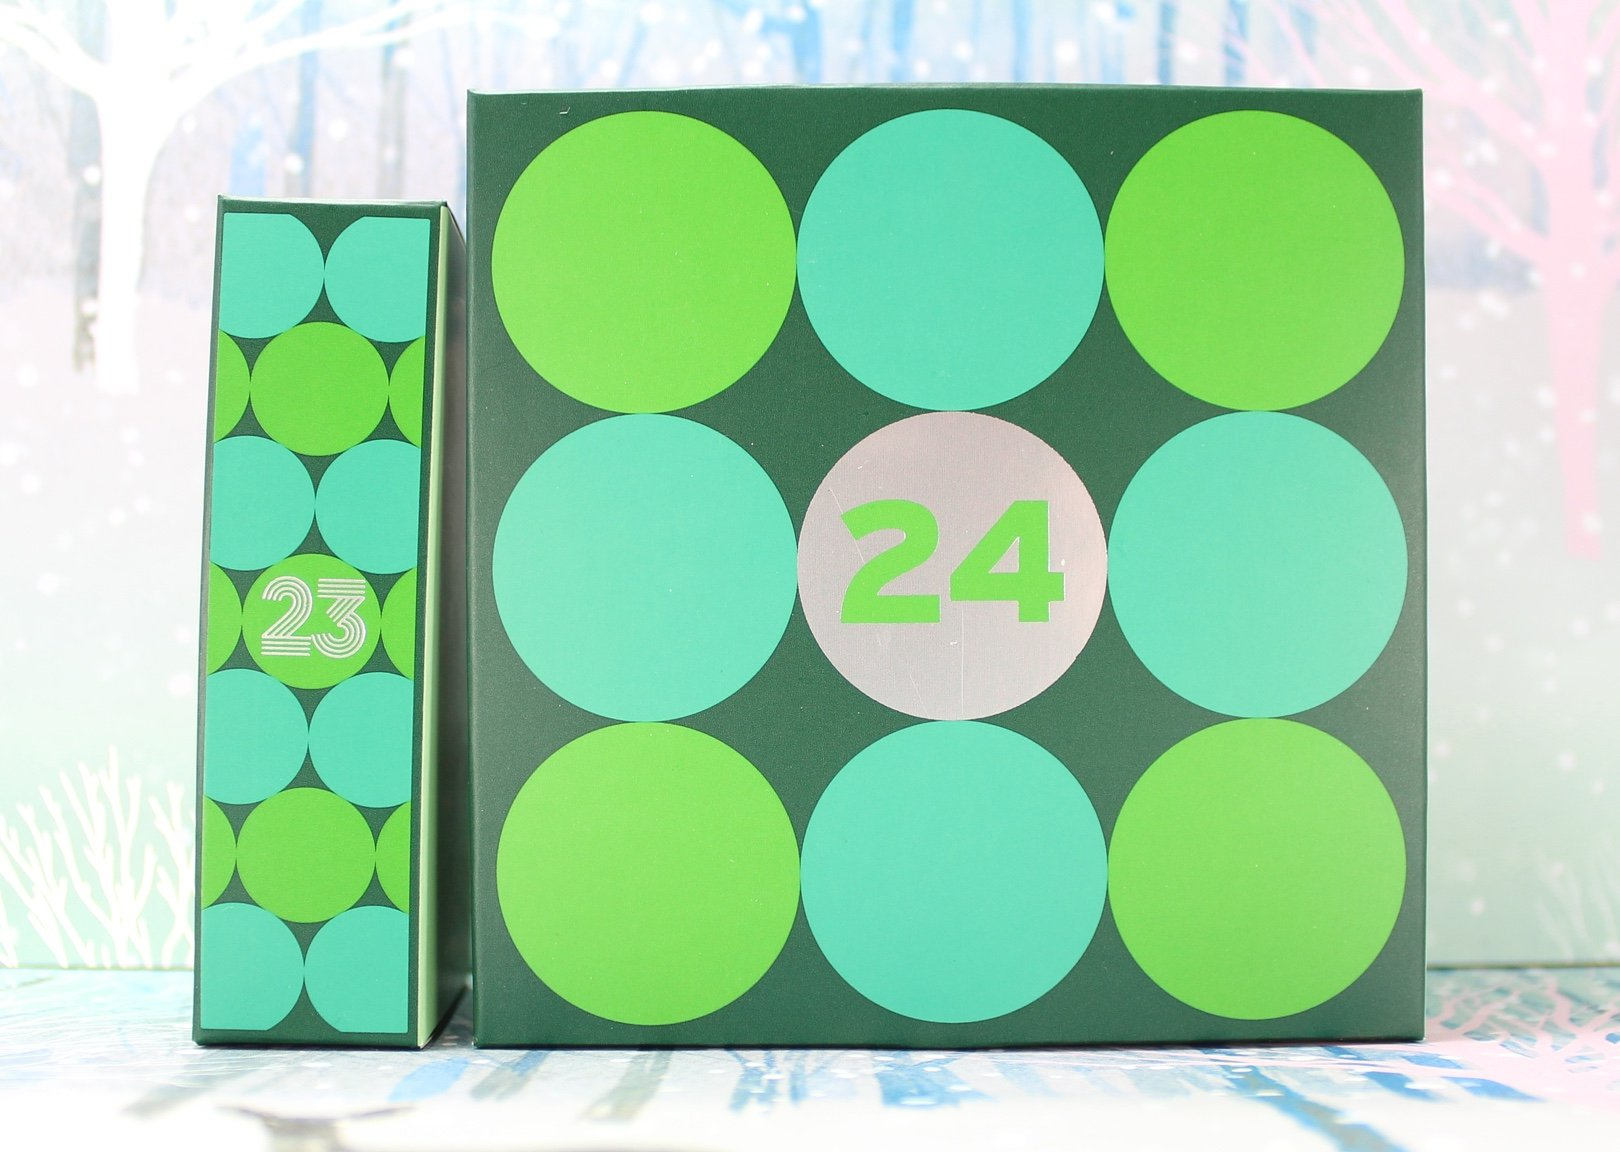 The Body Shop Deluxe Advent Calendar: Days 23 24